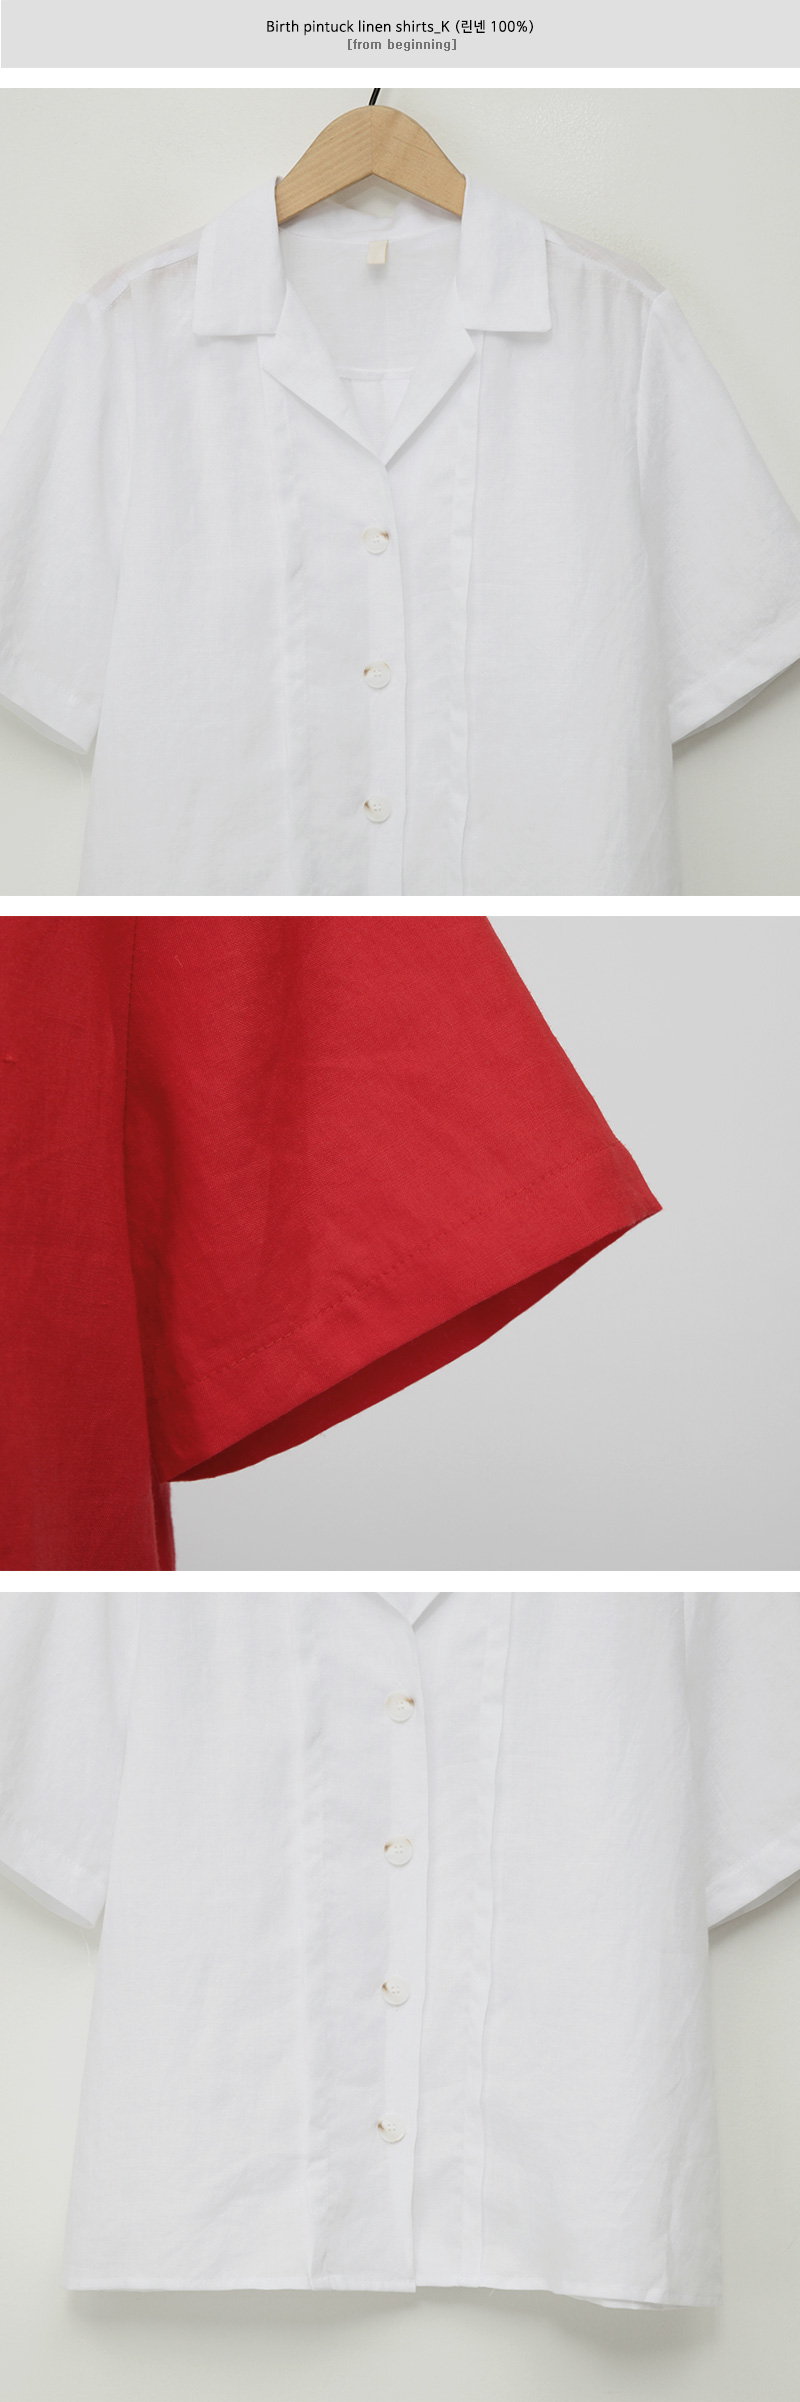 Birth pintuck linen shirts_K (size : free)